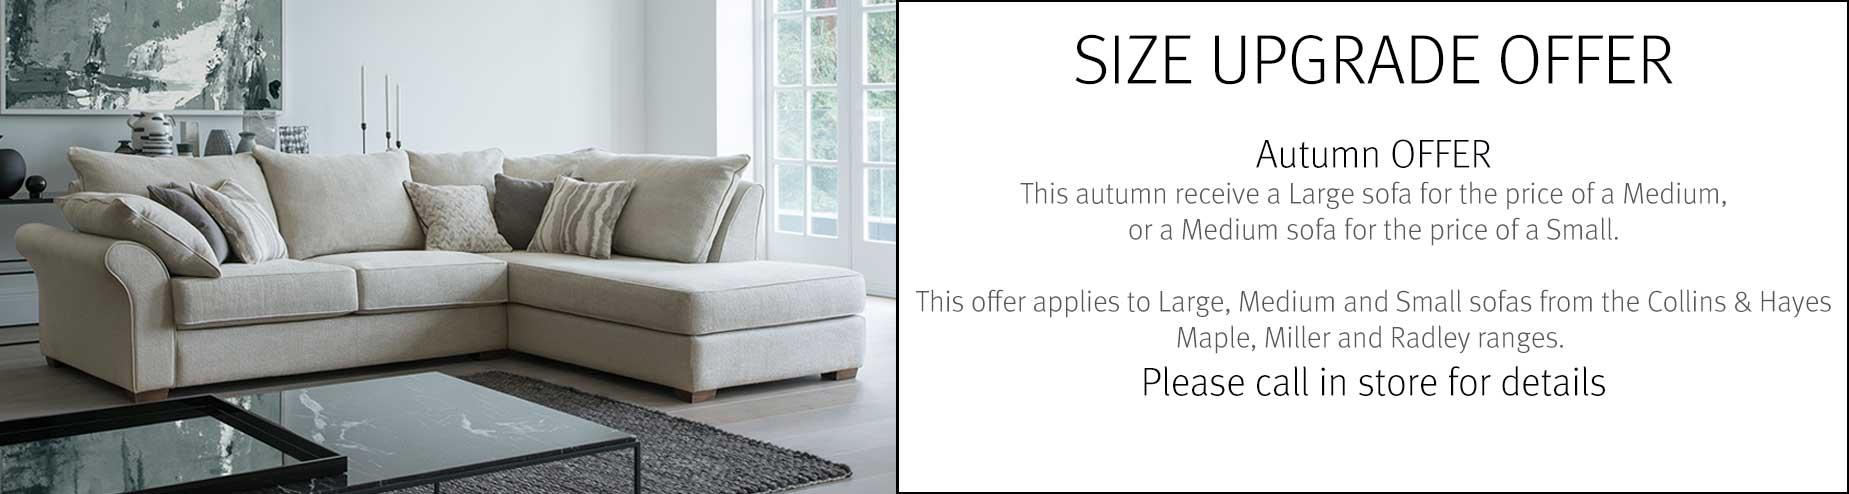 Size Upgrade Offer